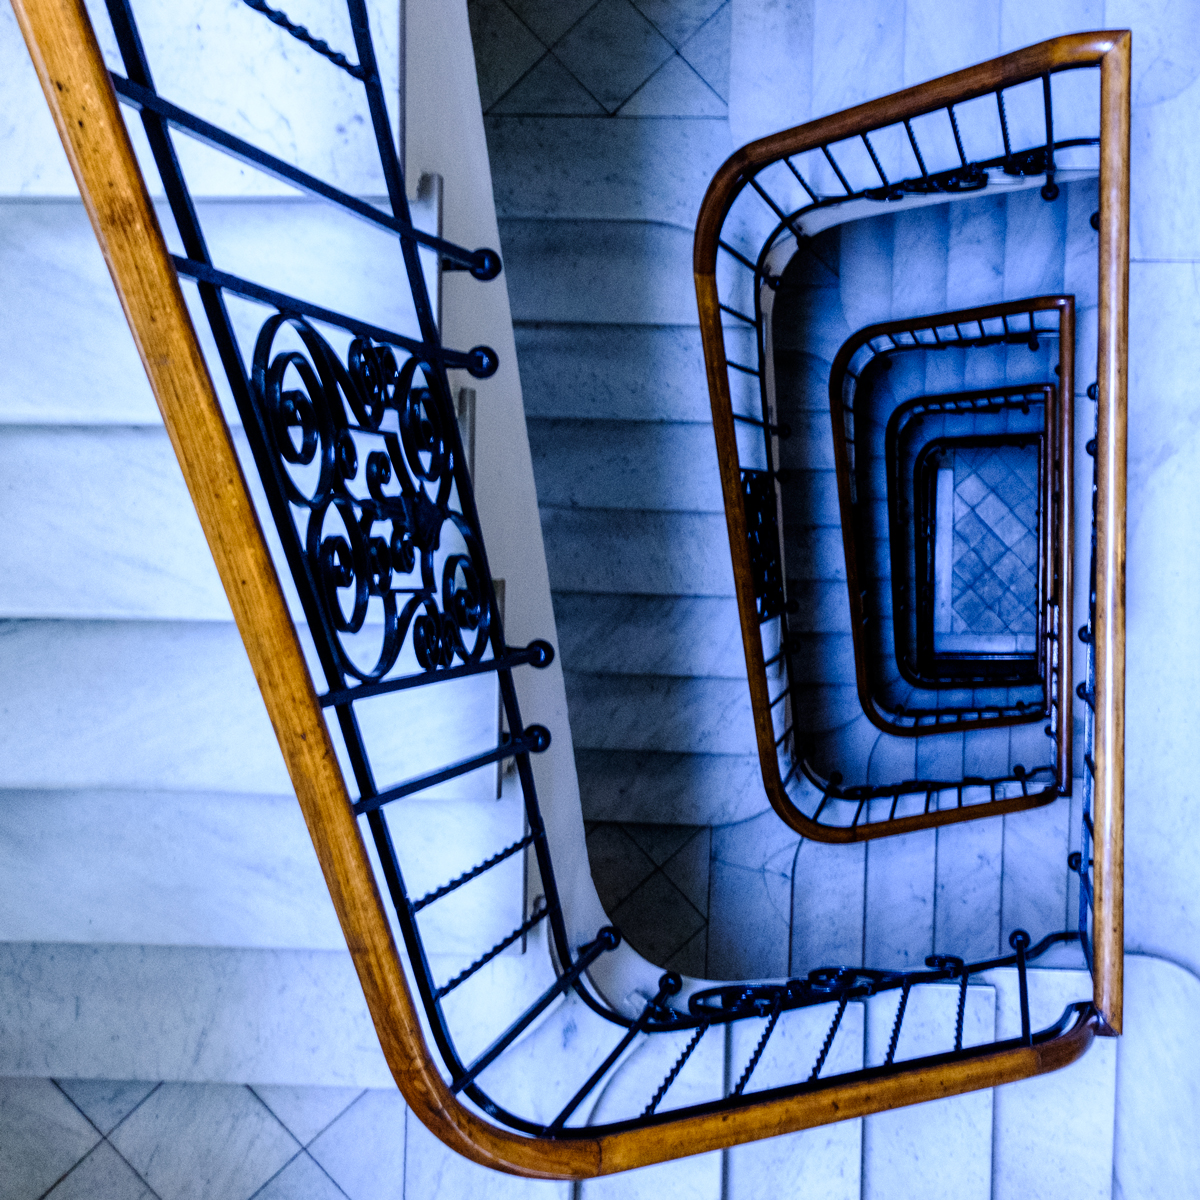 Escaleras acceso despacho en Zaragoza